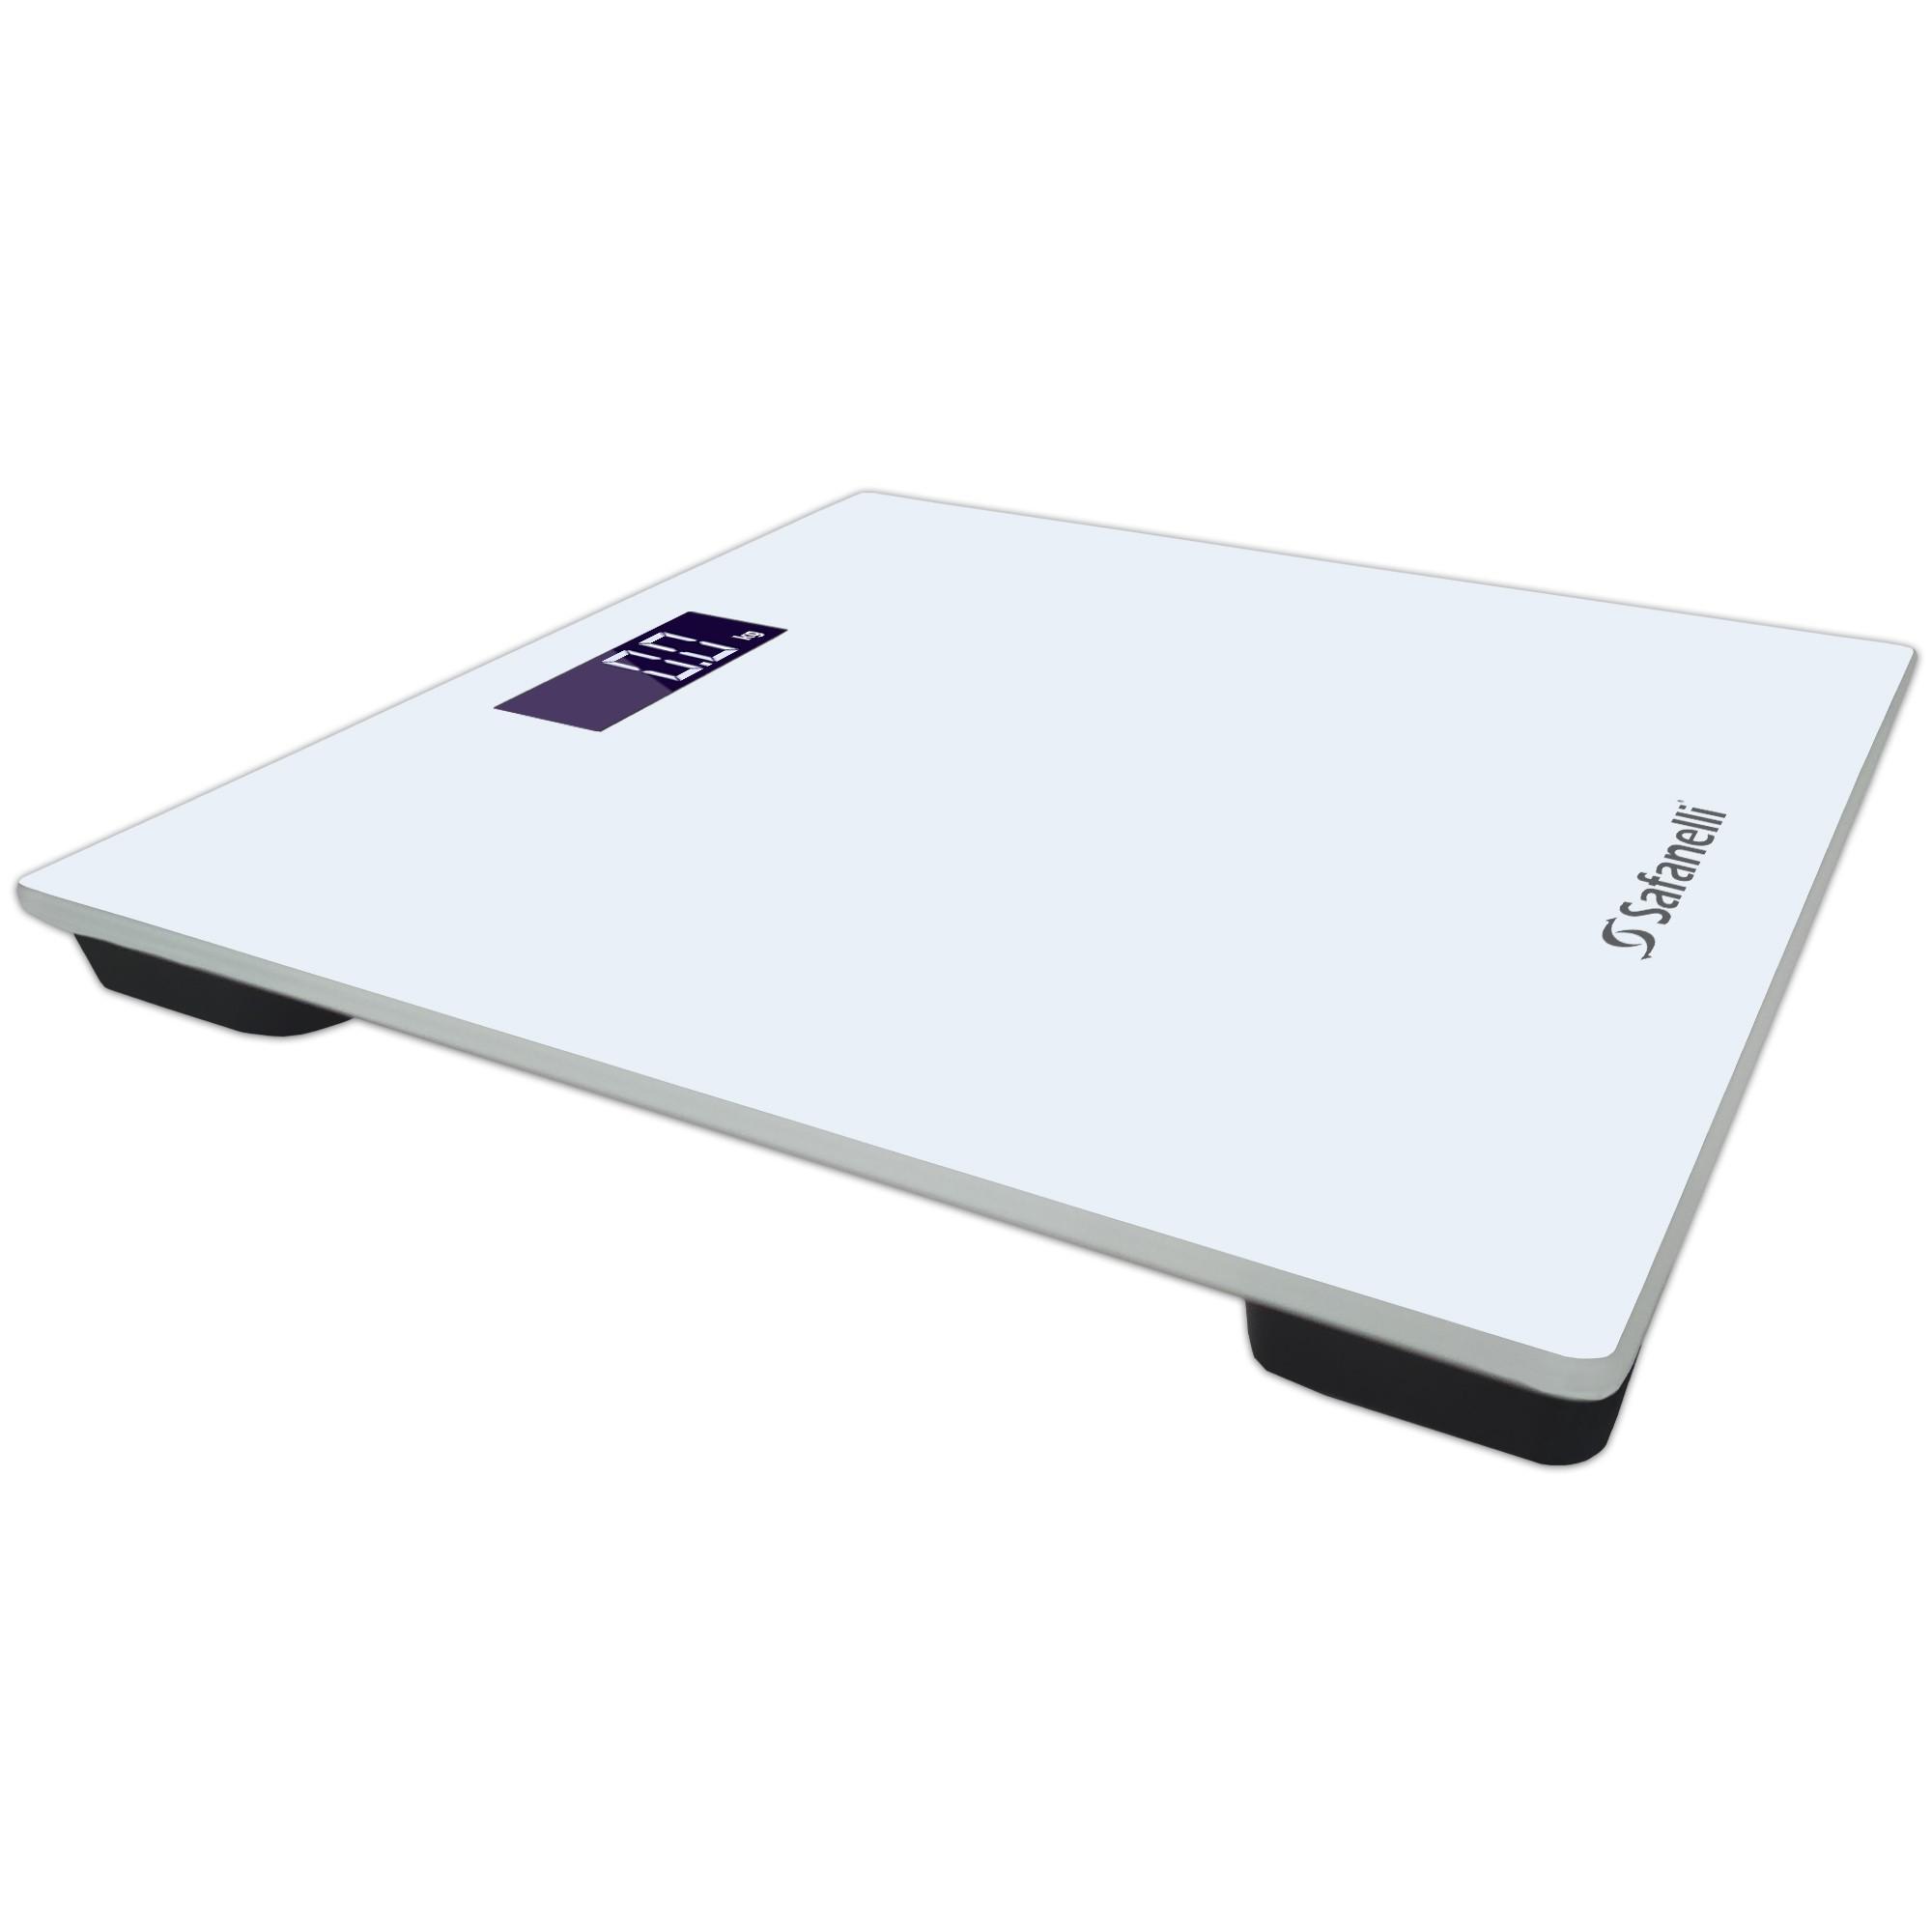 Balança Digital Vidro Temperado Branca Até 180kg Safanelli